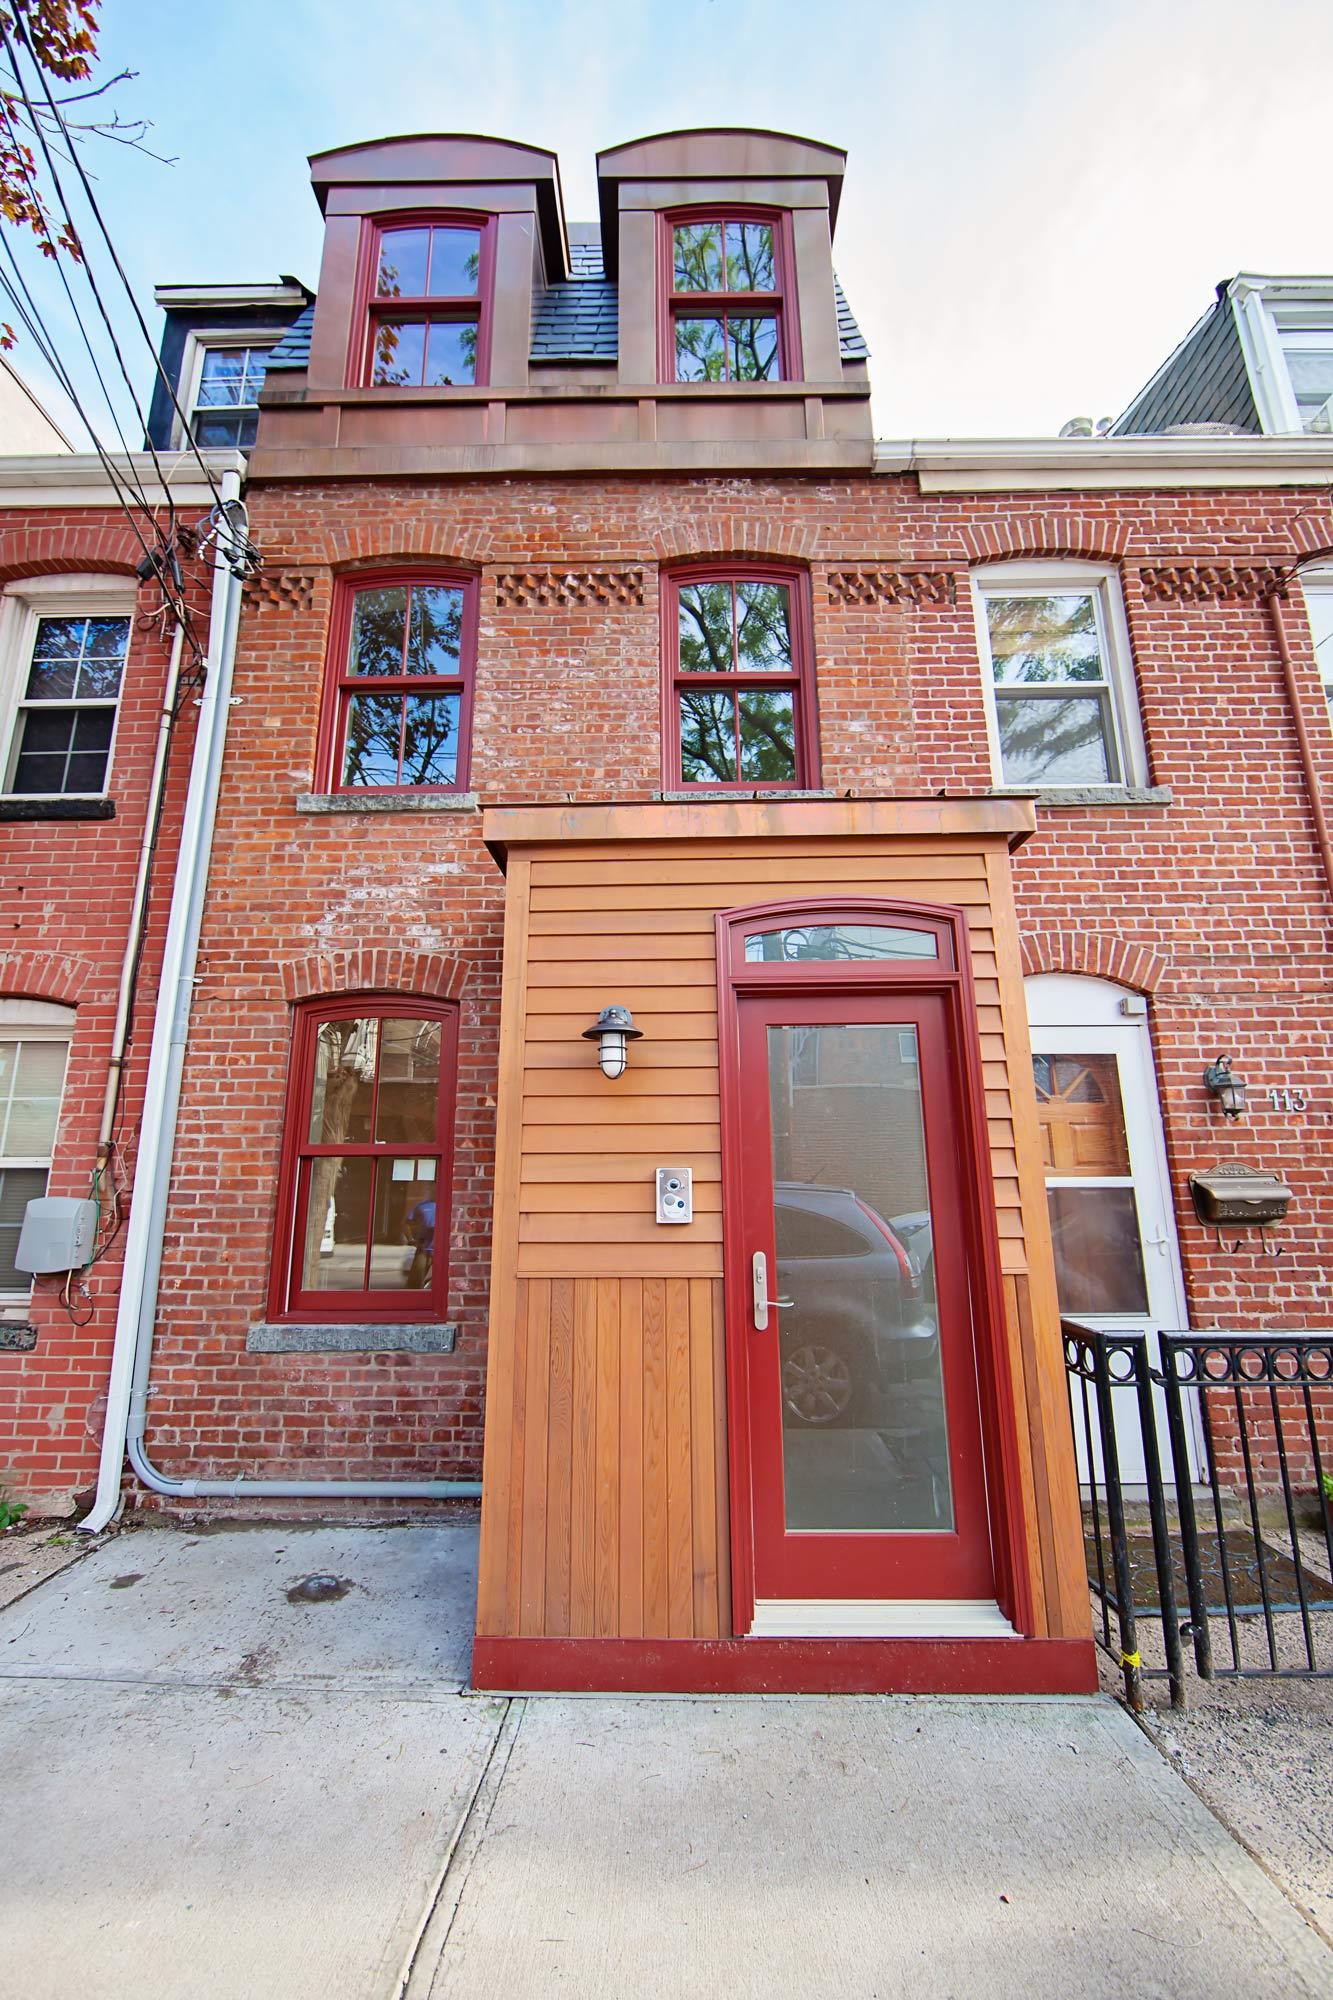 thompson-fine-home-renovations-hoboken-new-jersey-construction-13.jpg